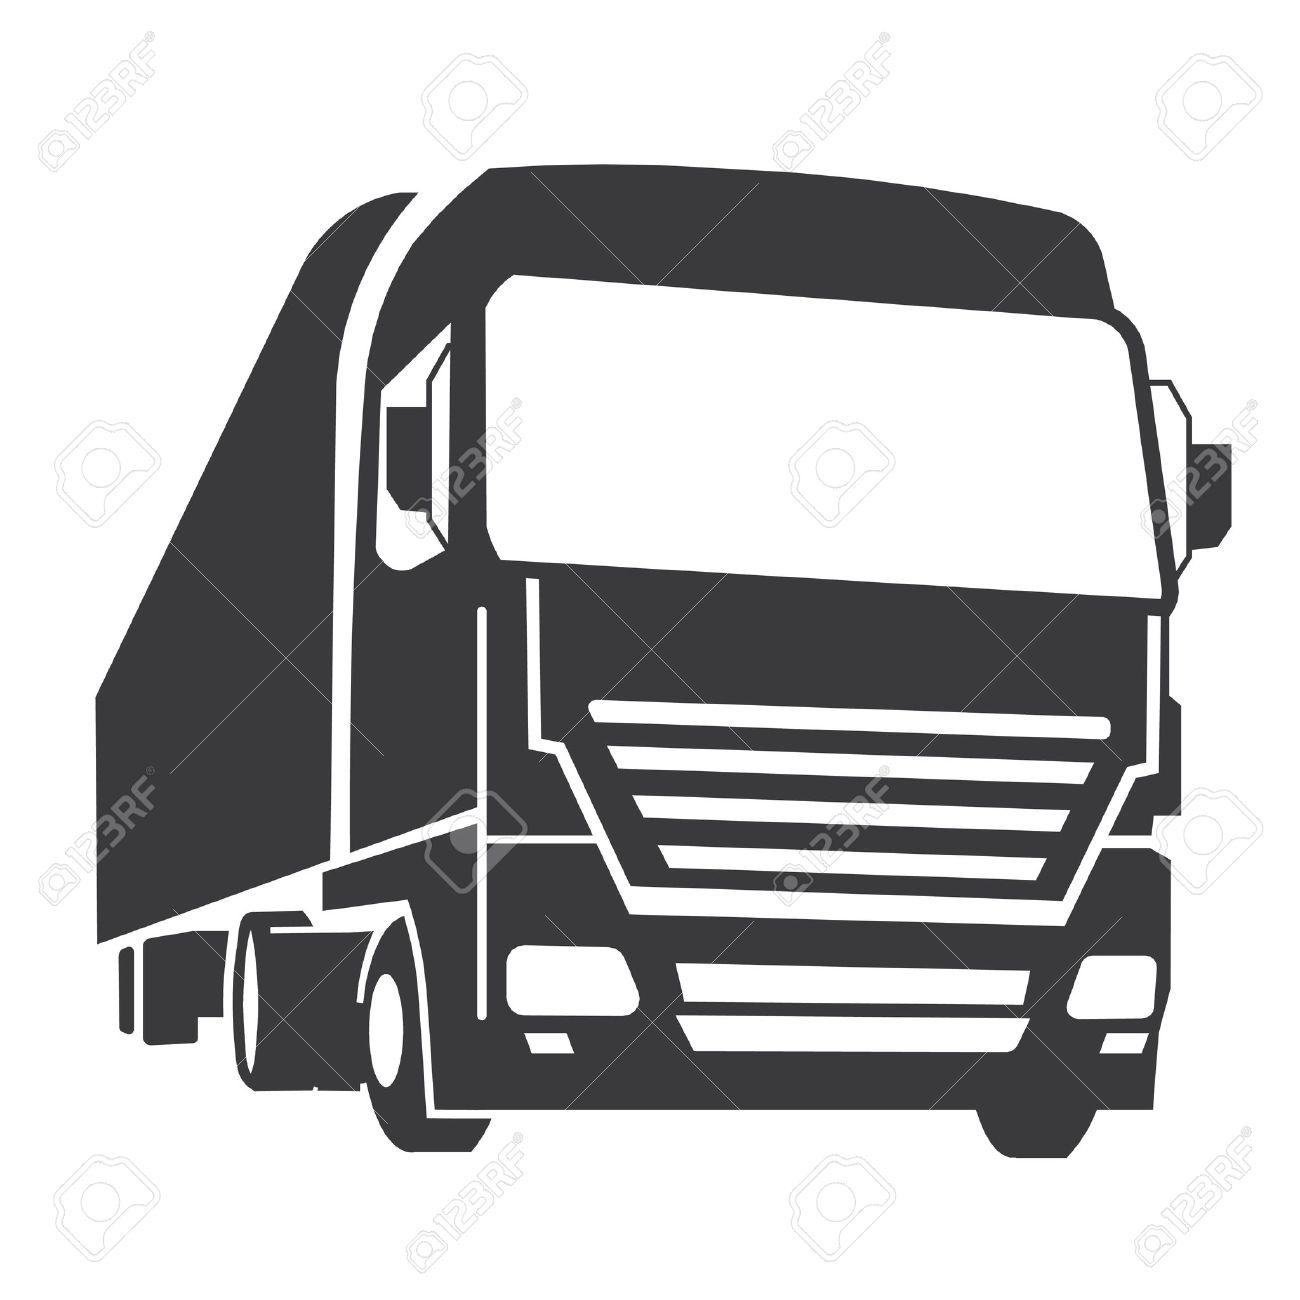 Truck icon - 11181495